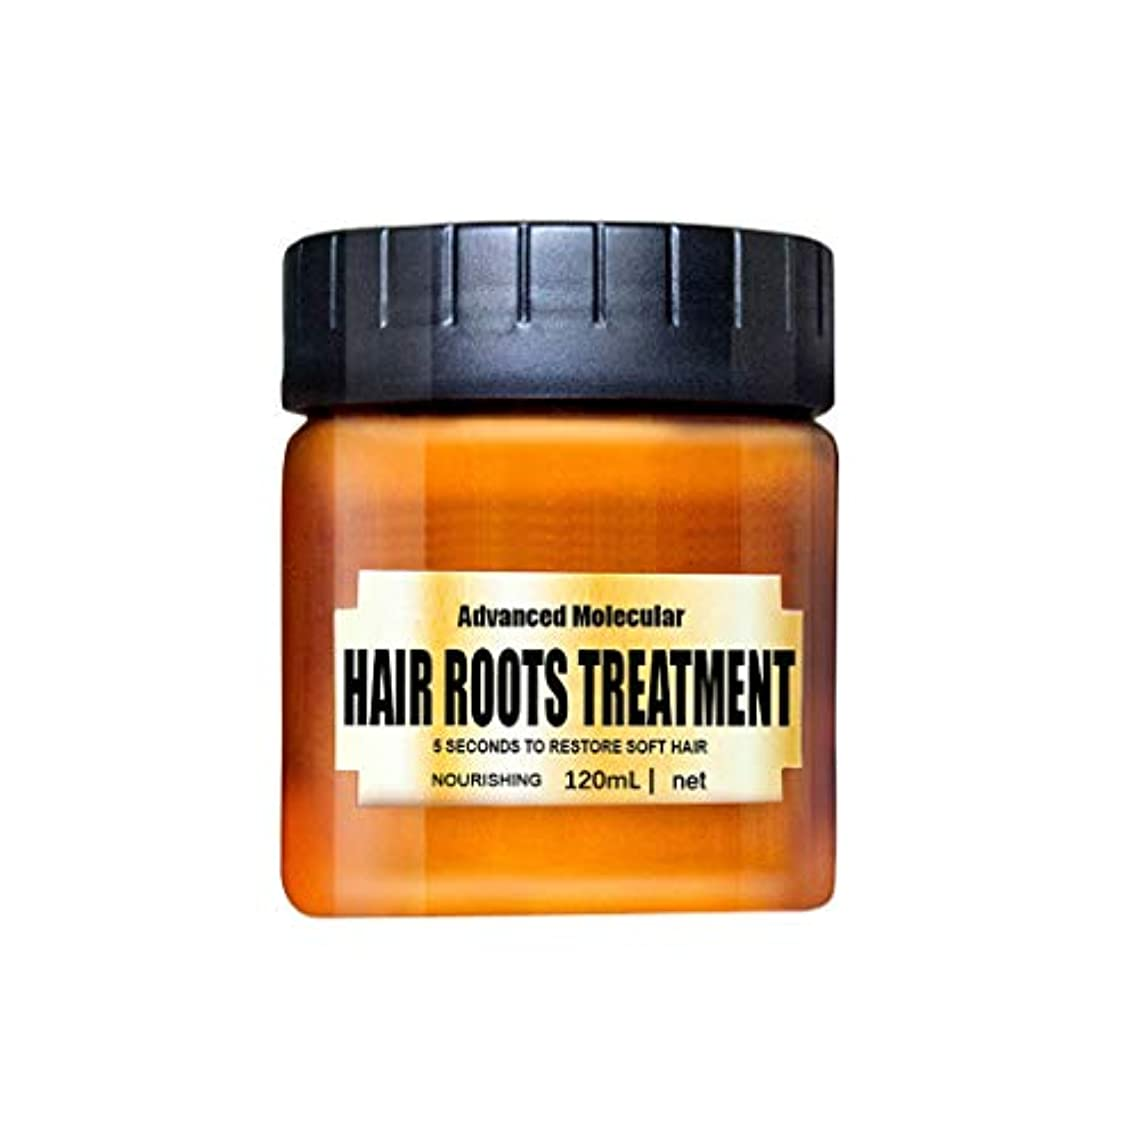 DOUJI 天然植物成分 ヘアケア リッチリペア コンディショナー120ml コンディショナー 髪の排毒ヘアマスク高度な分子毛根治療回復エクストラダメージケア トリート